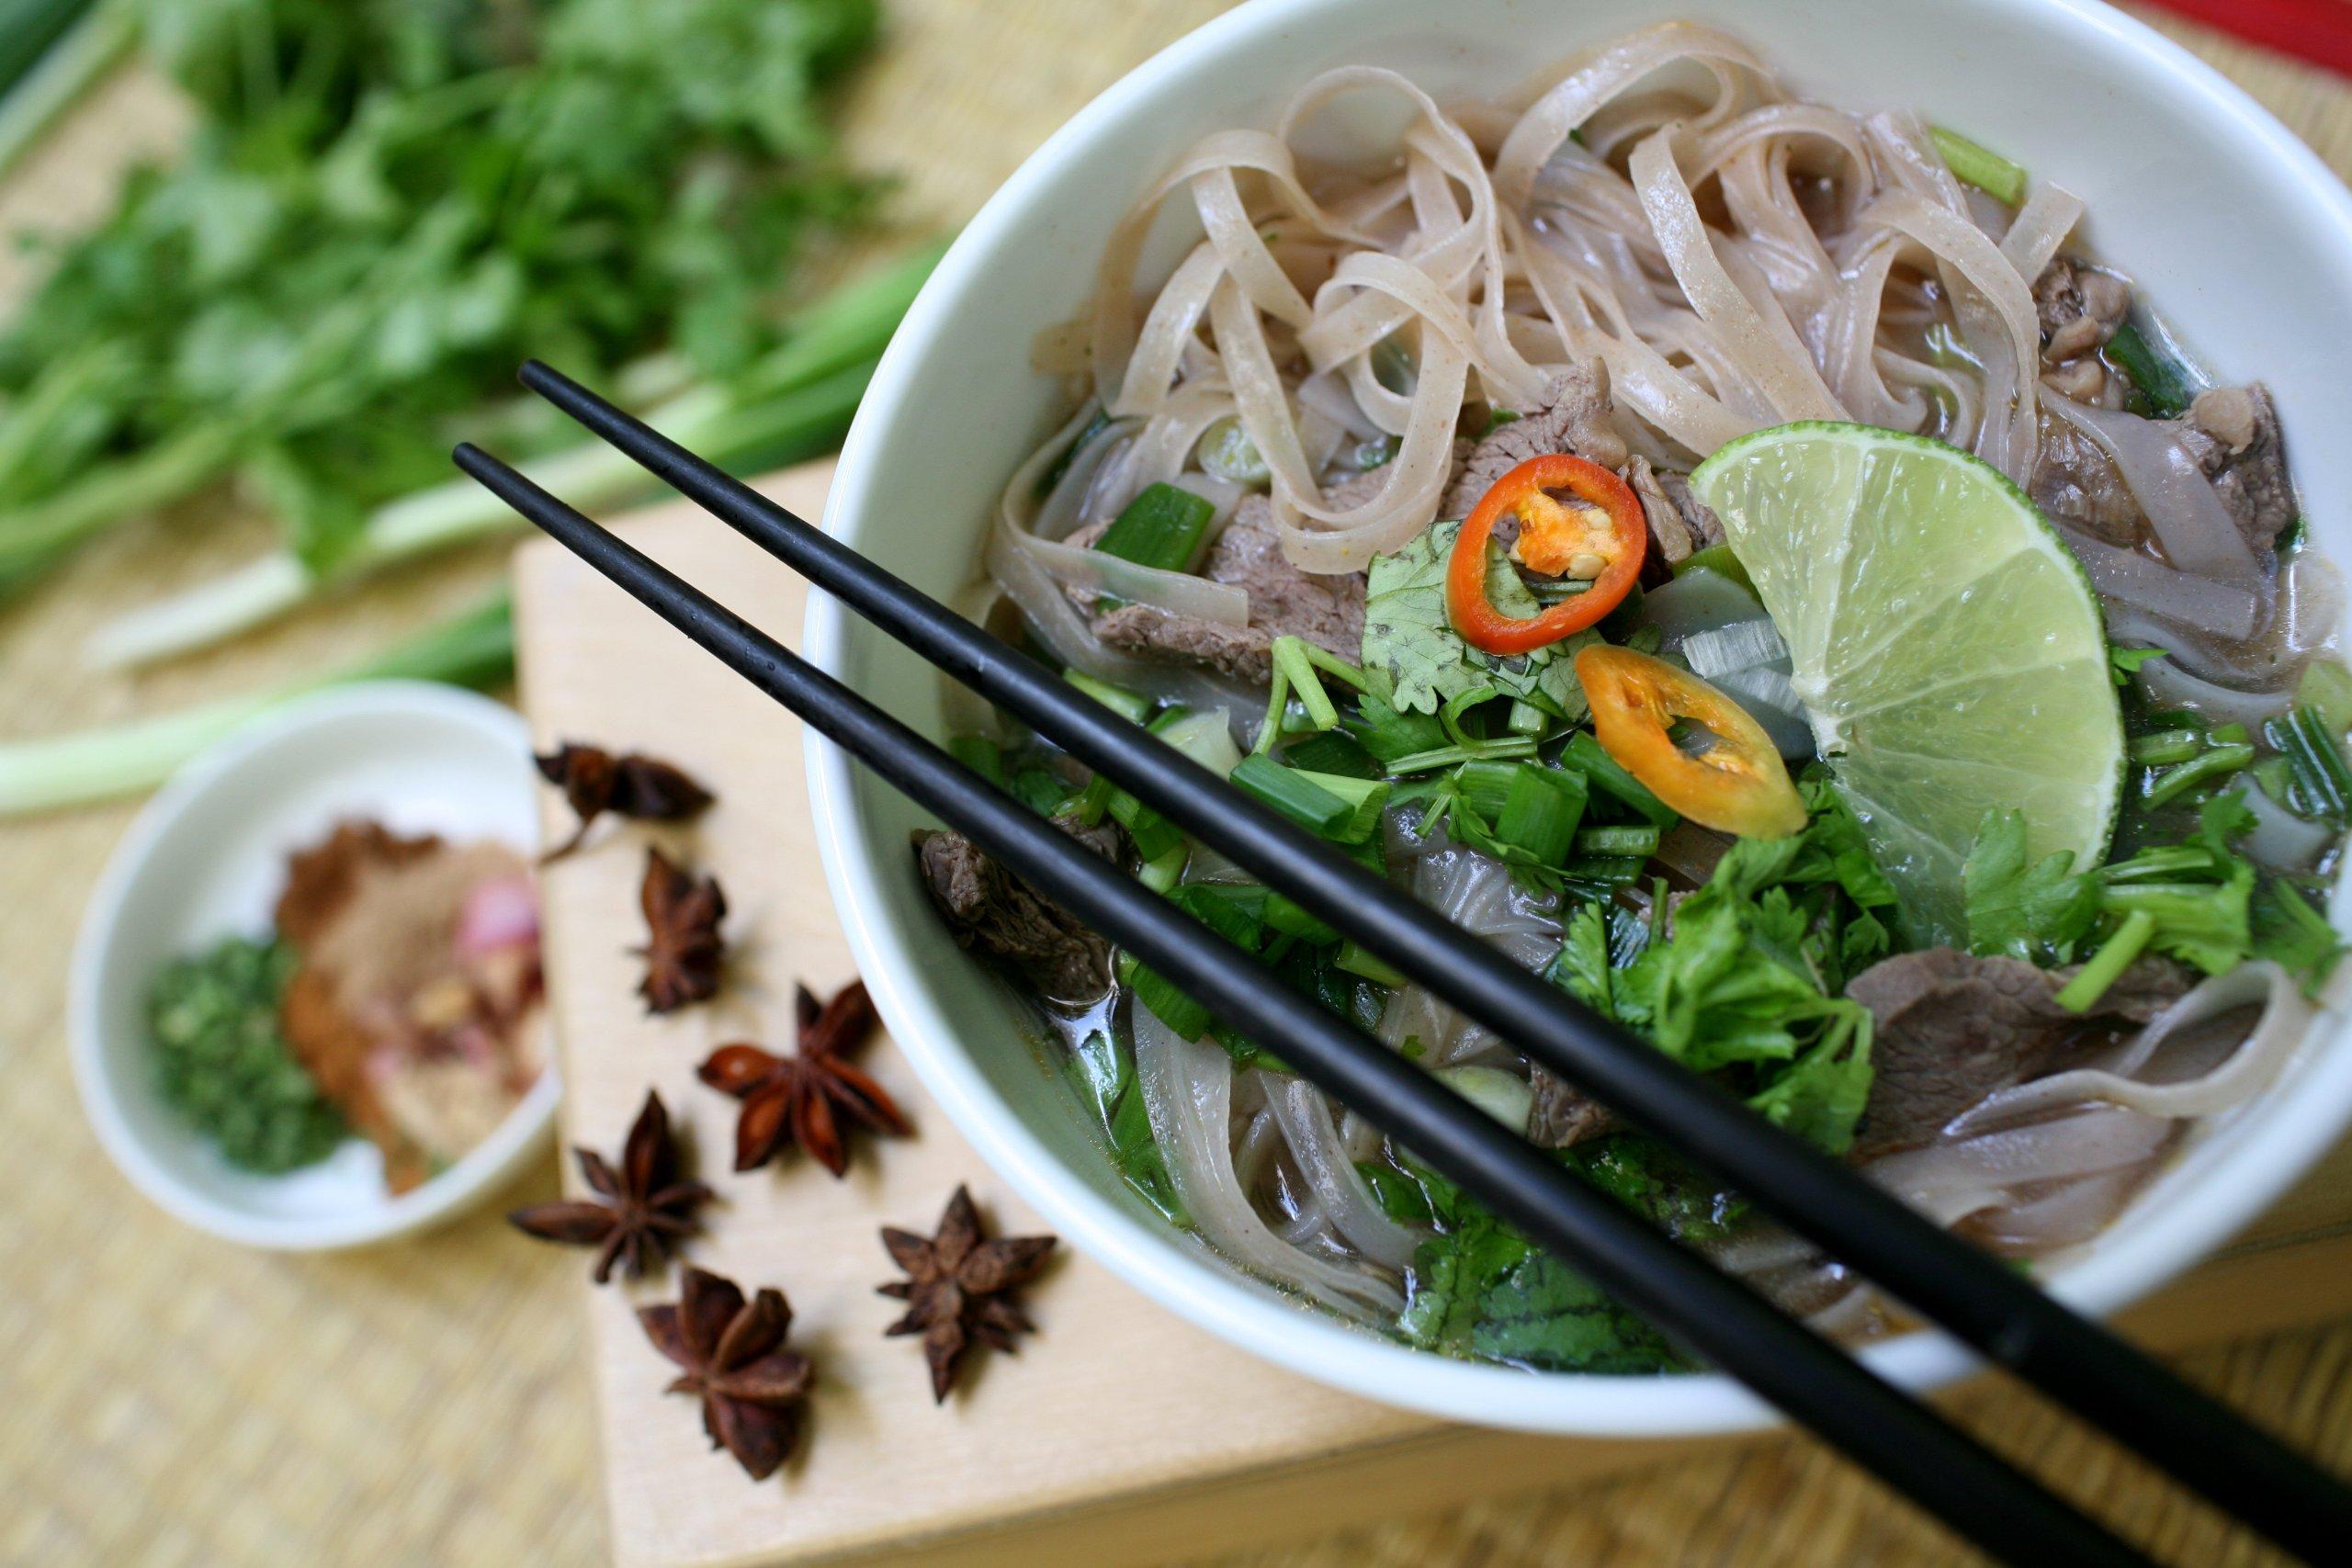 Star Anise Foods - NON GMO Gluten Free Vietnamese HAPPY PHO Shiitake Mushroom - 4.5 oz/2 Servings per box, Pack of 6 boxes